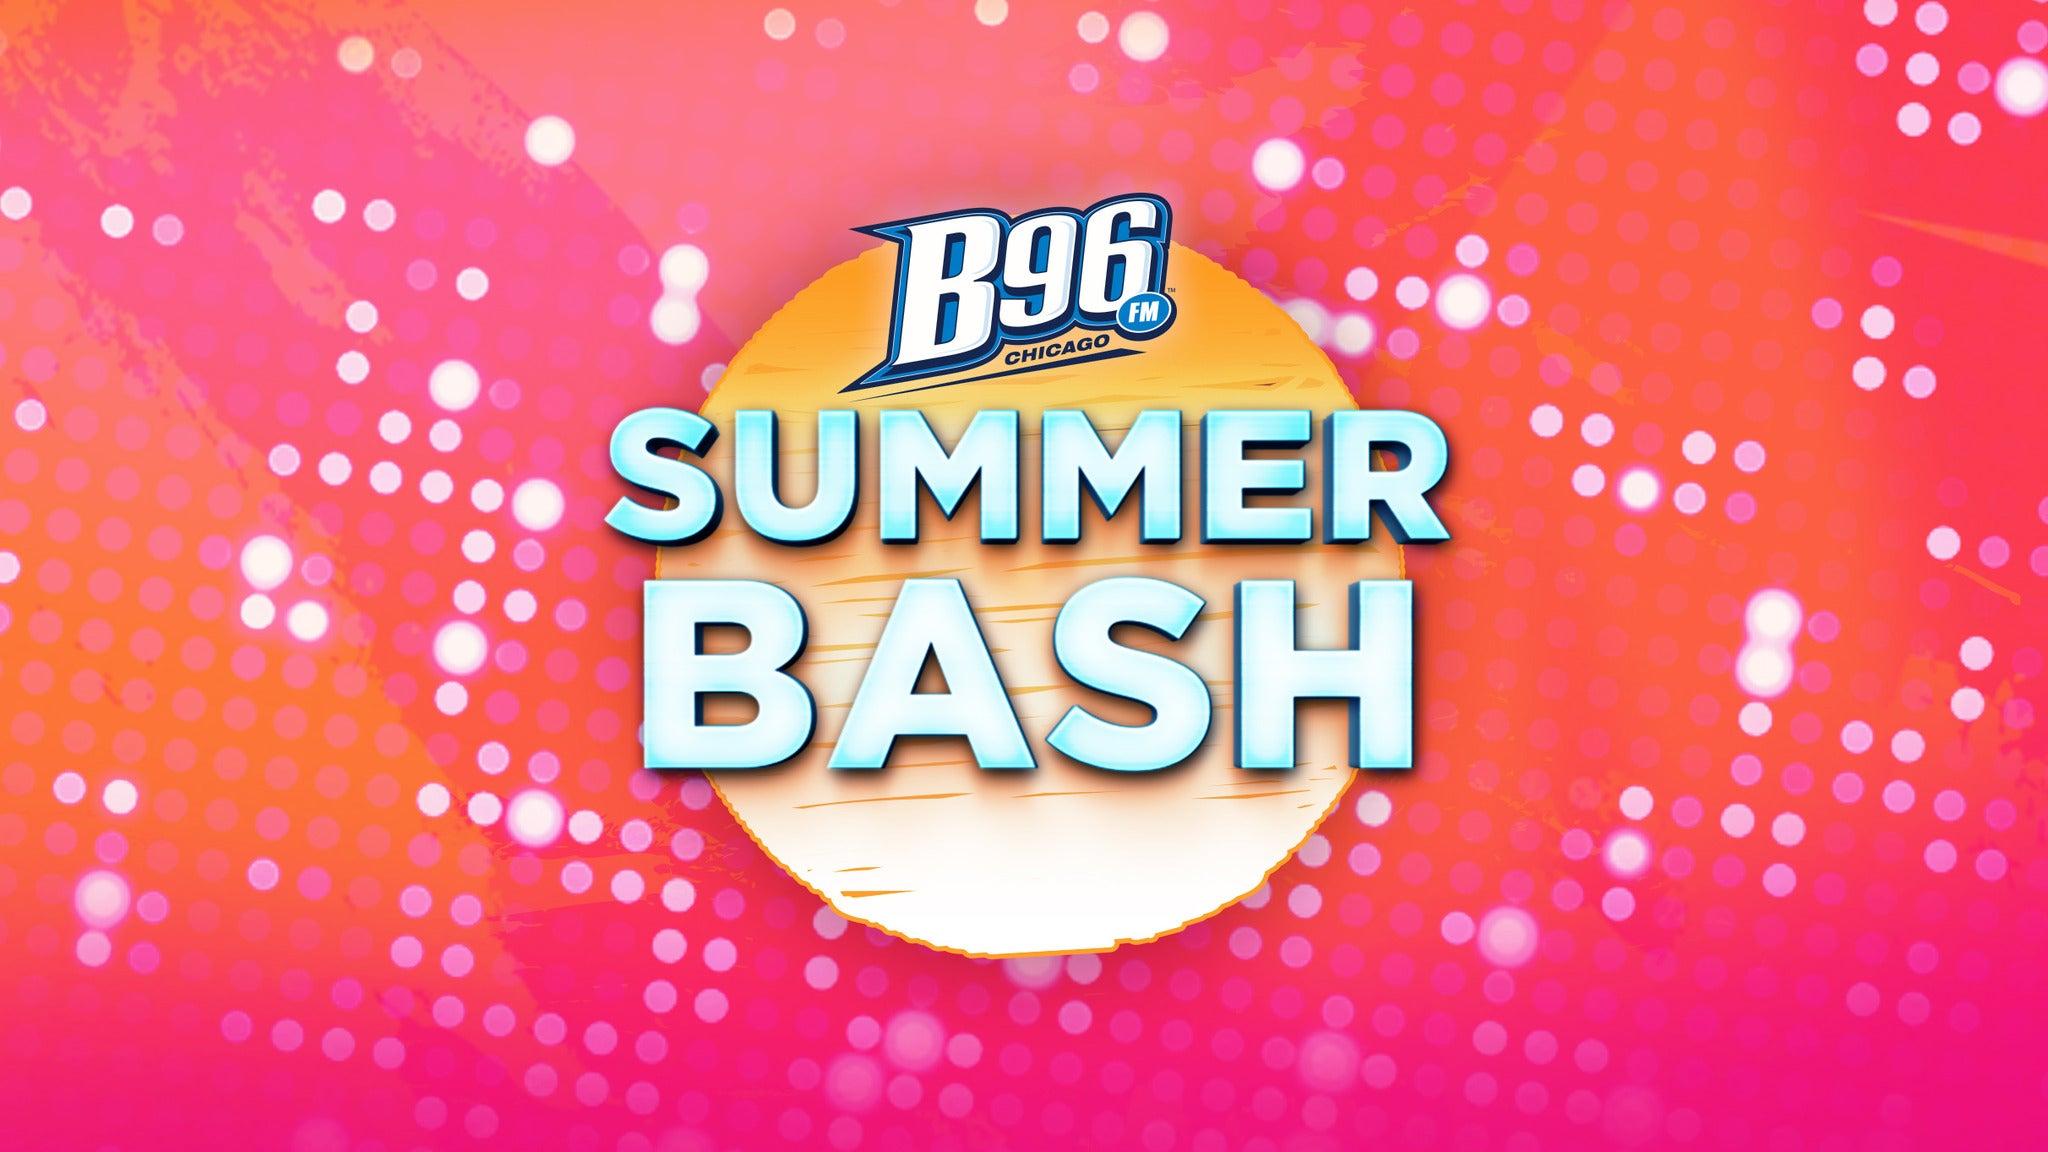 B96 Summer Bash at Allstate Arena